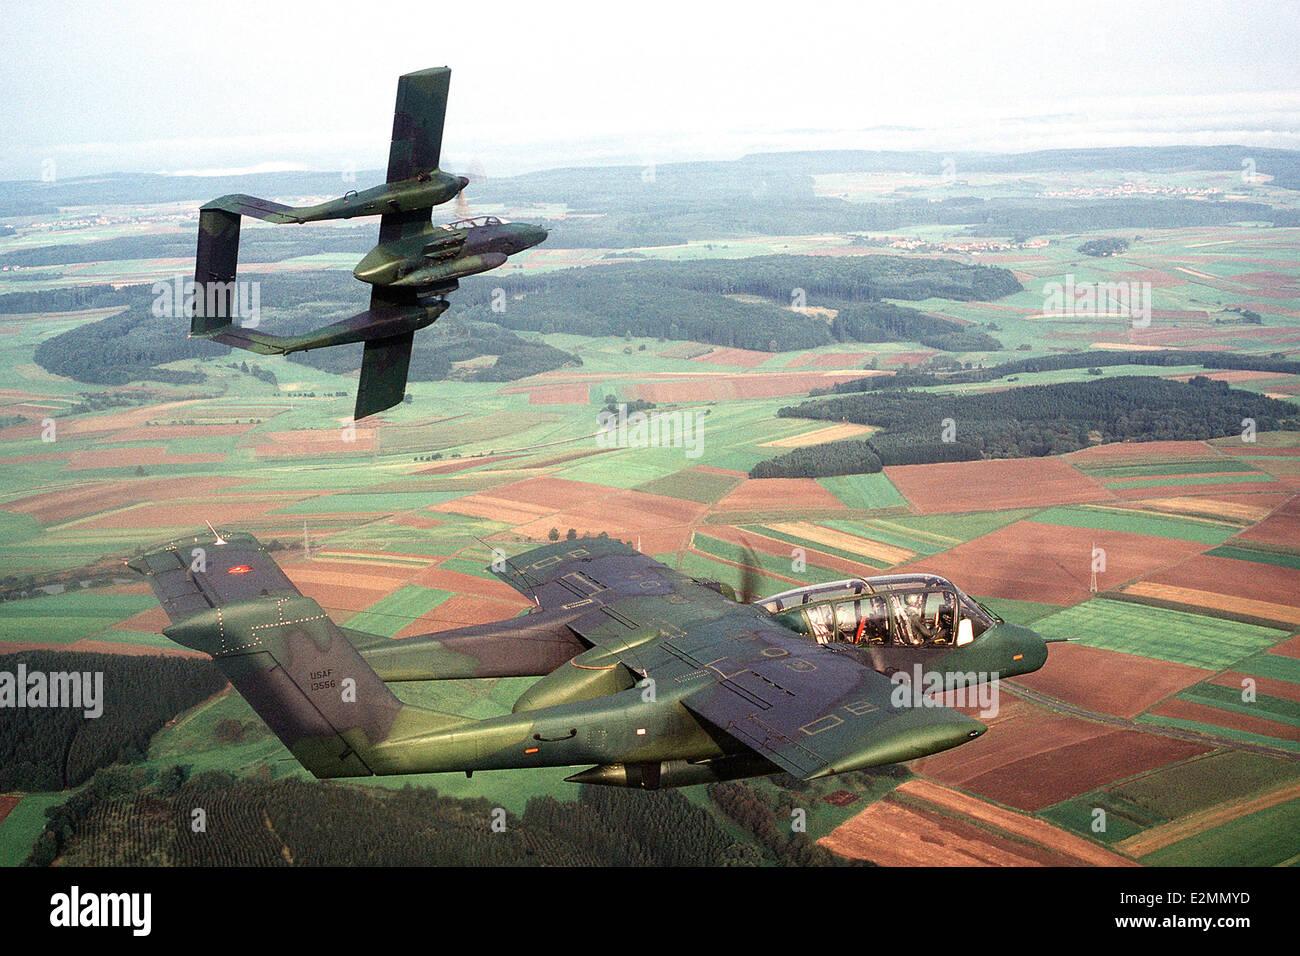 OV-10 Bronco aircraft, Light Armed Reconnaissance Aircraft - Stock Image